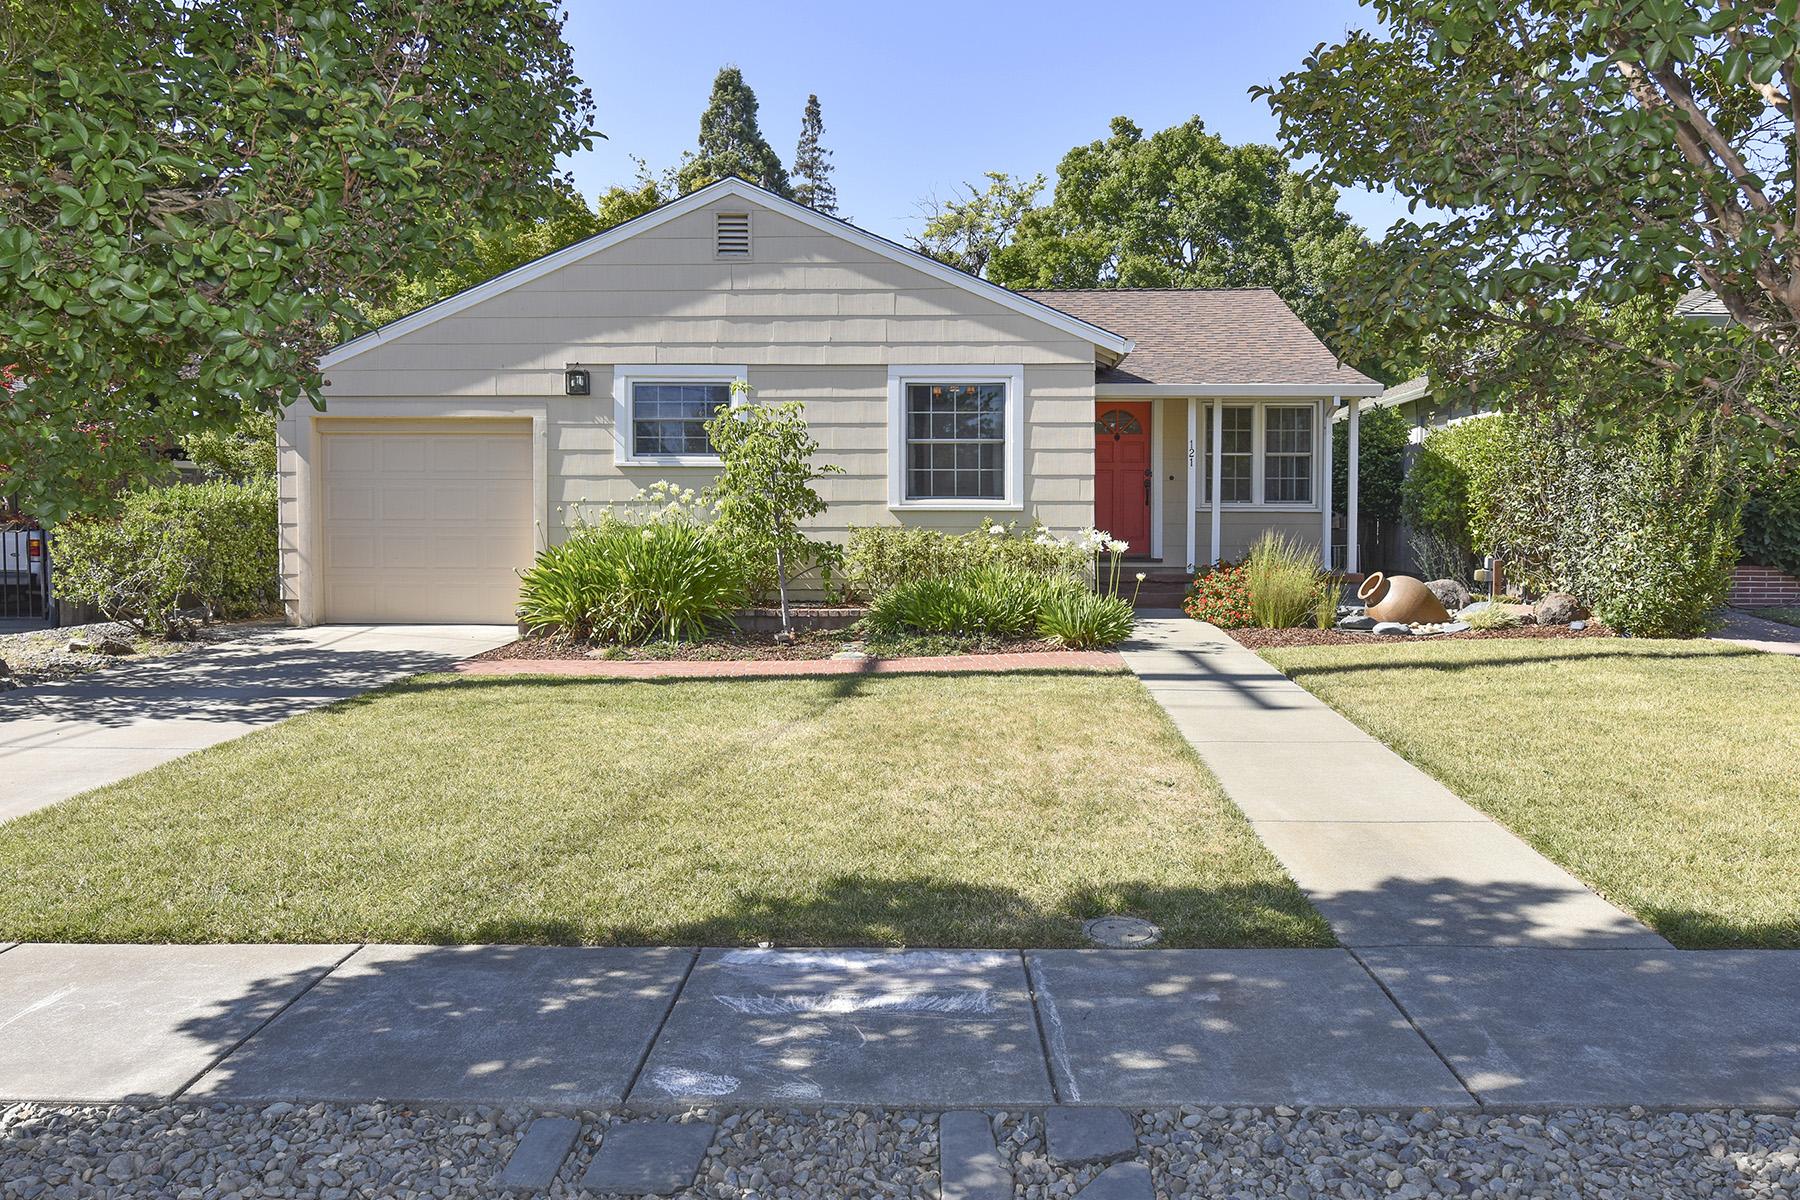 Nhà ở một gia đình vì Bán tại 121 Fairview Dr, Napa, CA 94559 121 Fairview Dr Napa, California, 94559 Hoa Kỳ